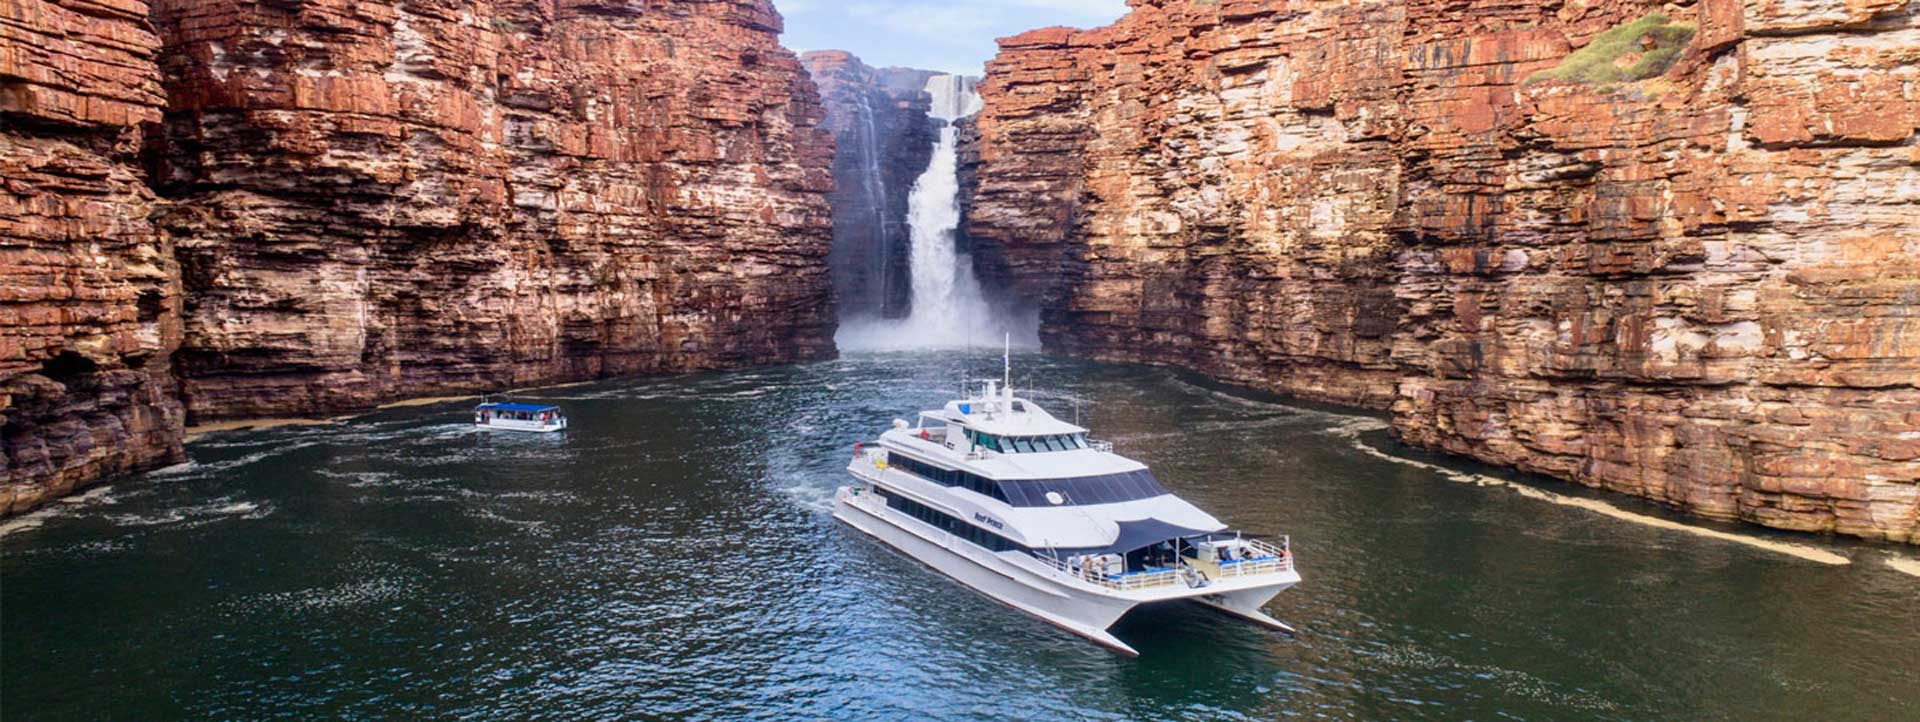 REEF-PRINCE-Kimberley-cruises-King-George-Falls